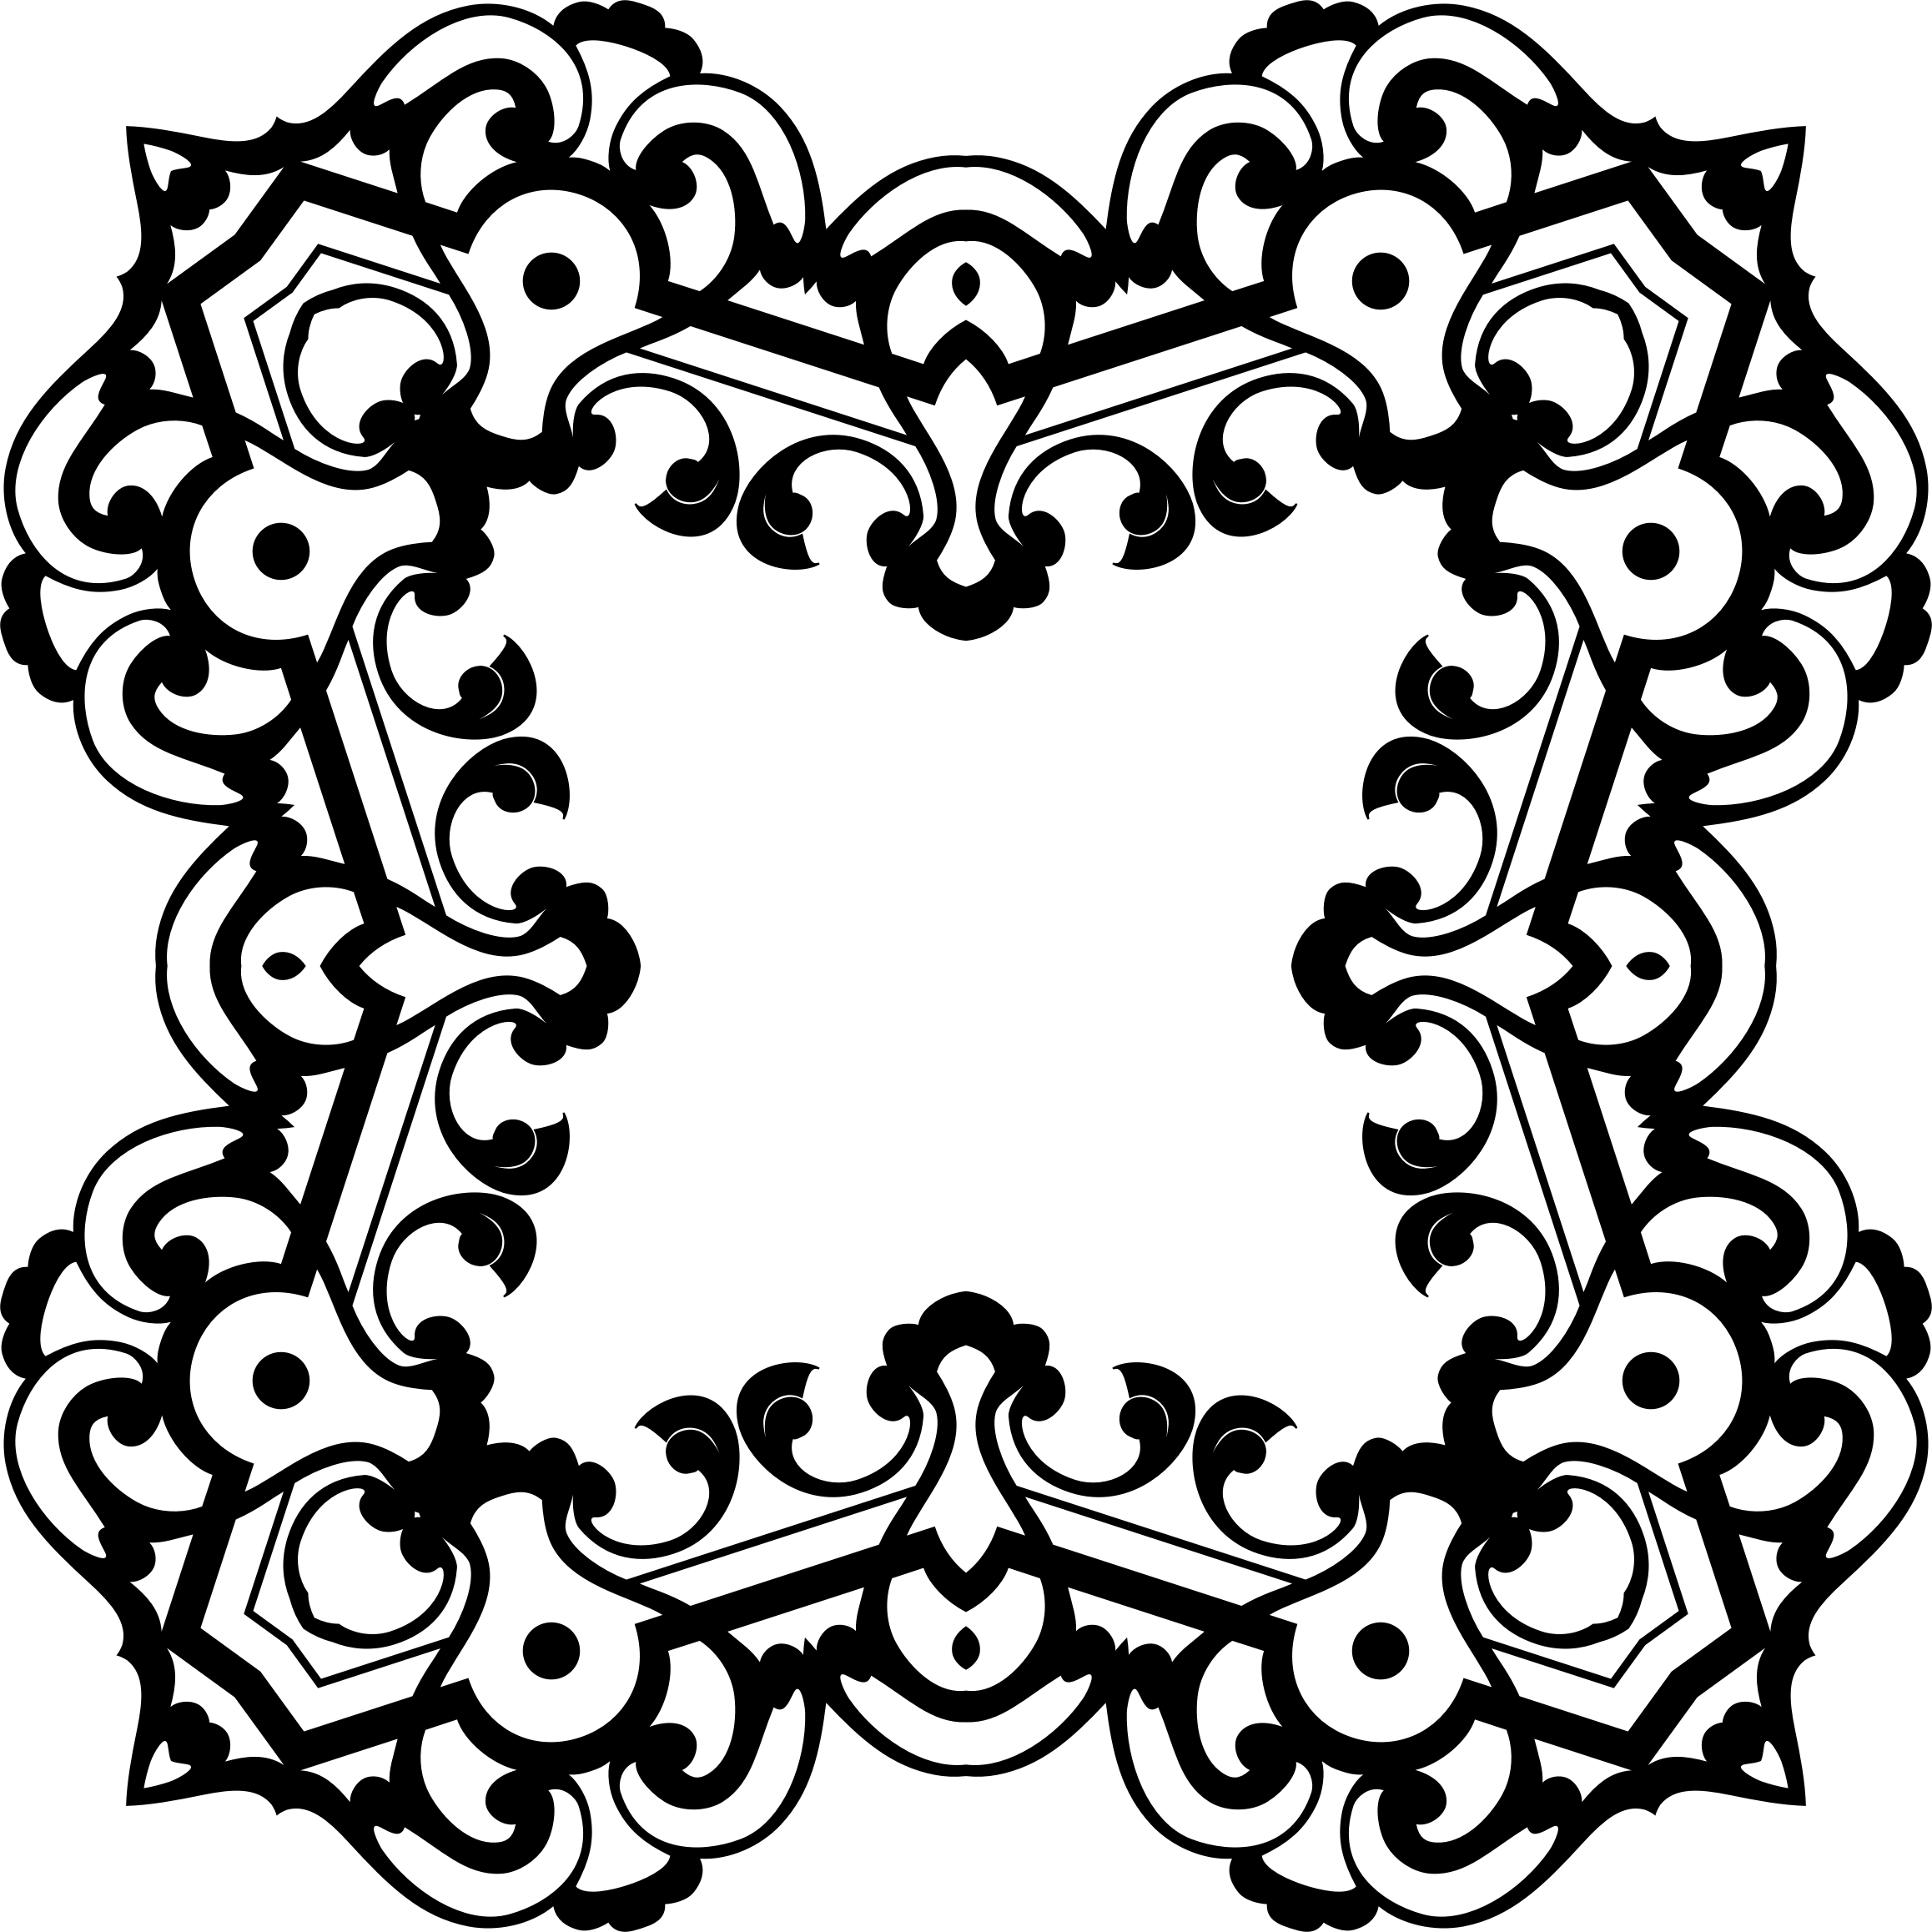 2316x2316 Clipart